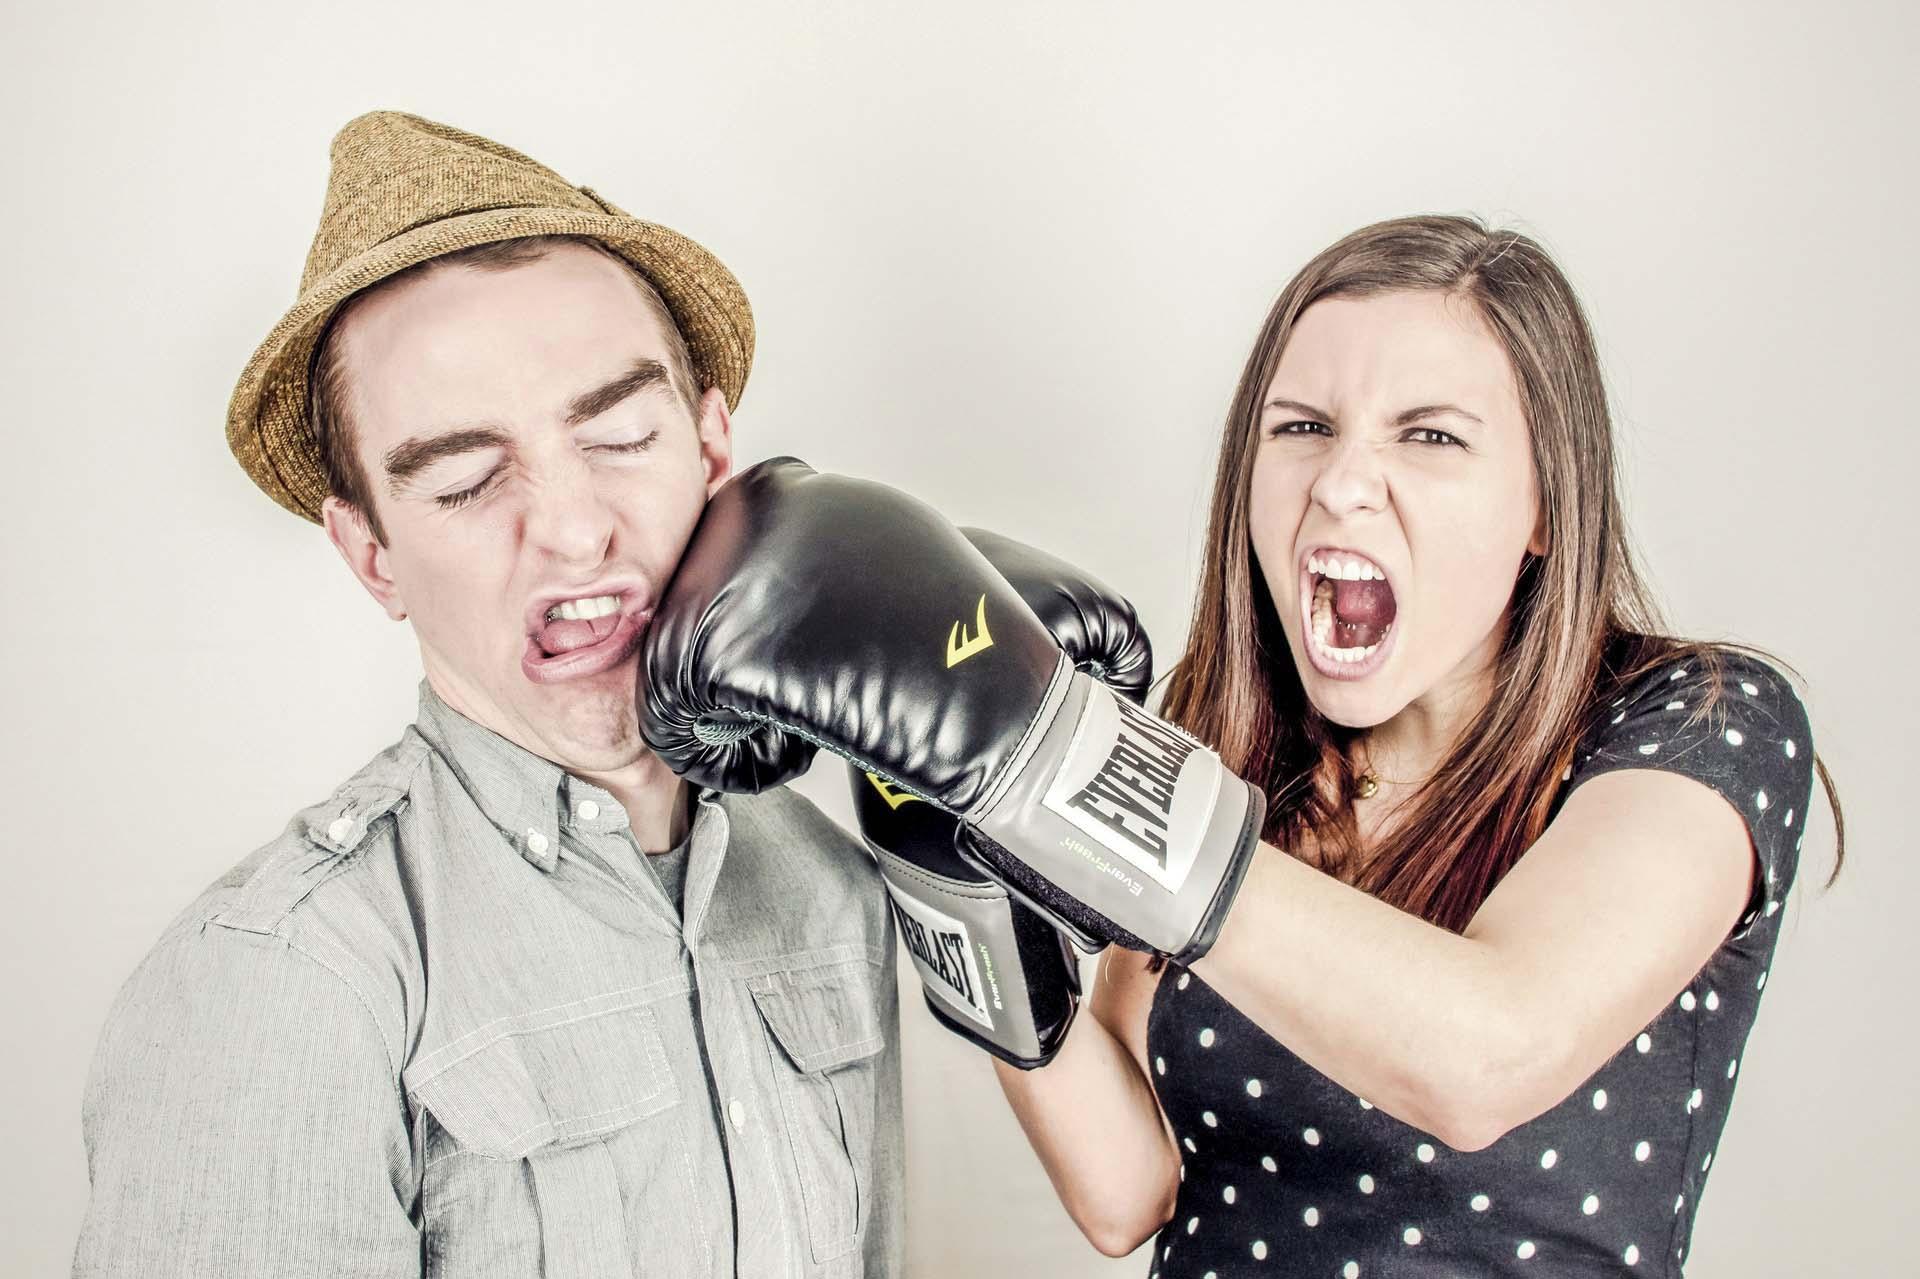 arguing-argument-boxing-boy-60884